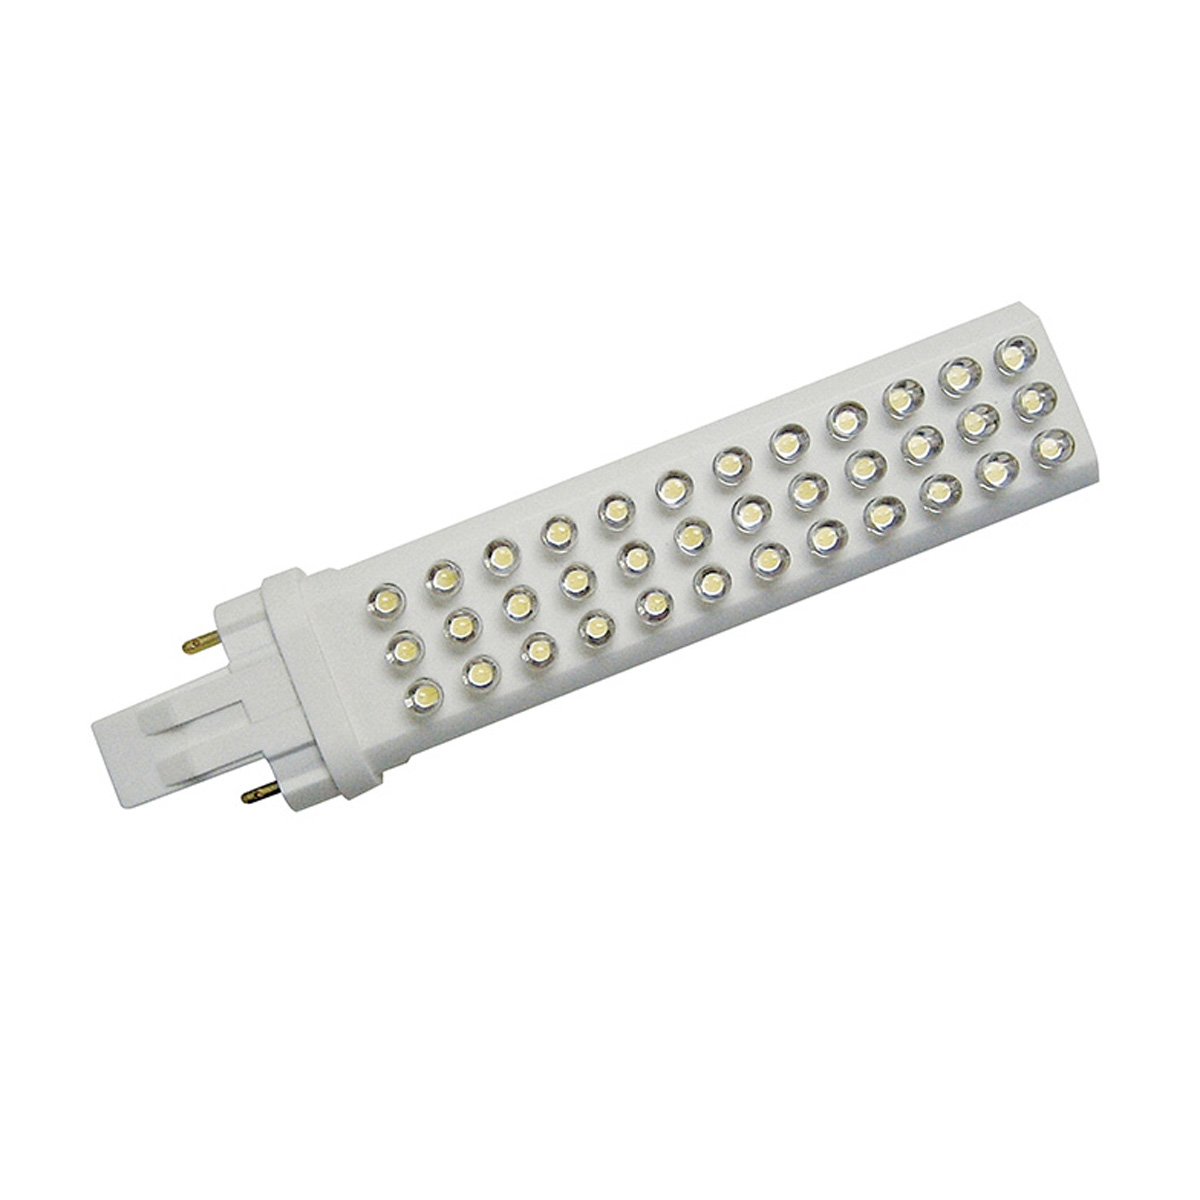 led hospital bed lamp pl13 gx23 2 pin watt man l e d lighting